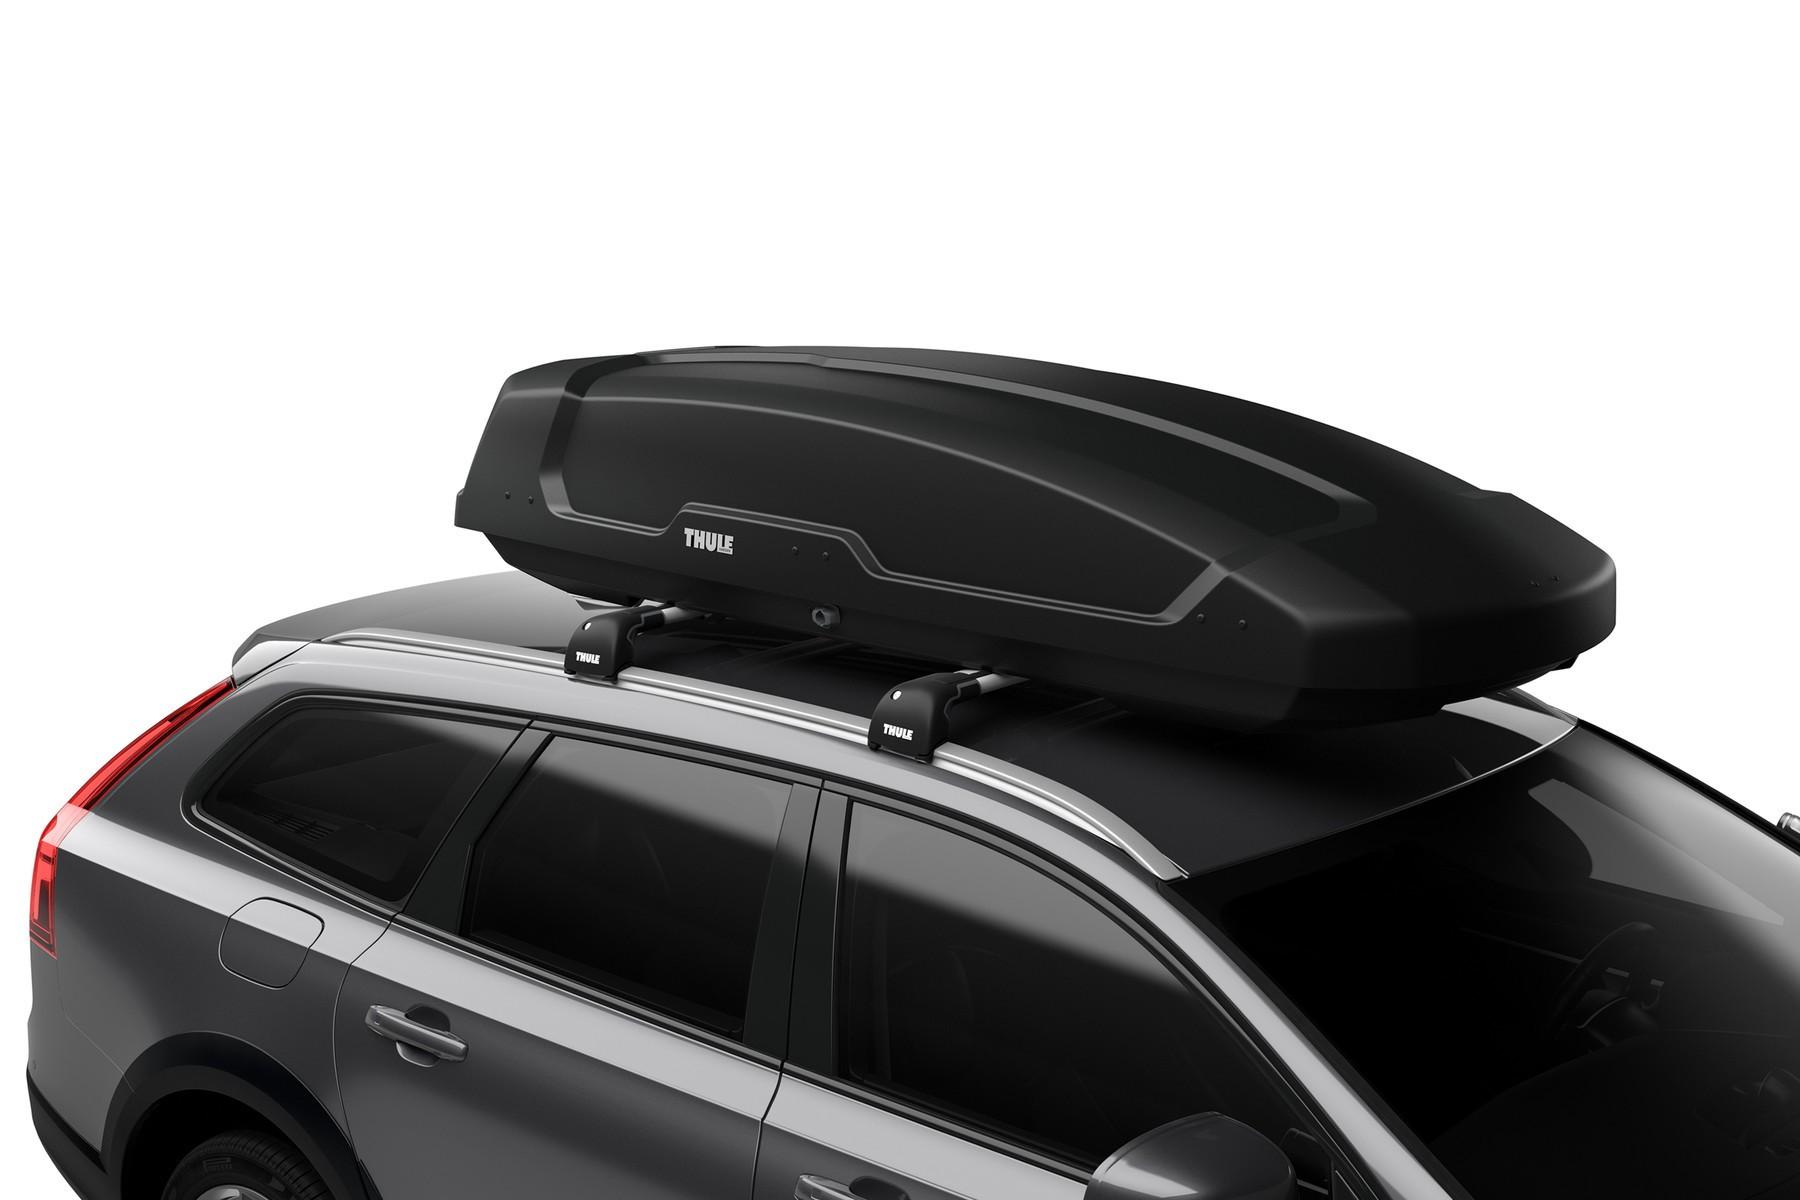 Alu-Relingtr/äger Dachgep/äcktr/äger f/ür aufliegende Reling im Set f/ür Audi A6 4F Avant 04-11 VDP Dachbox schwarz Juxt 500 gro/ßer Dachkoffer 500 Liter abschlie/ßbar